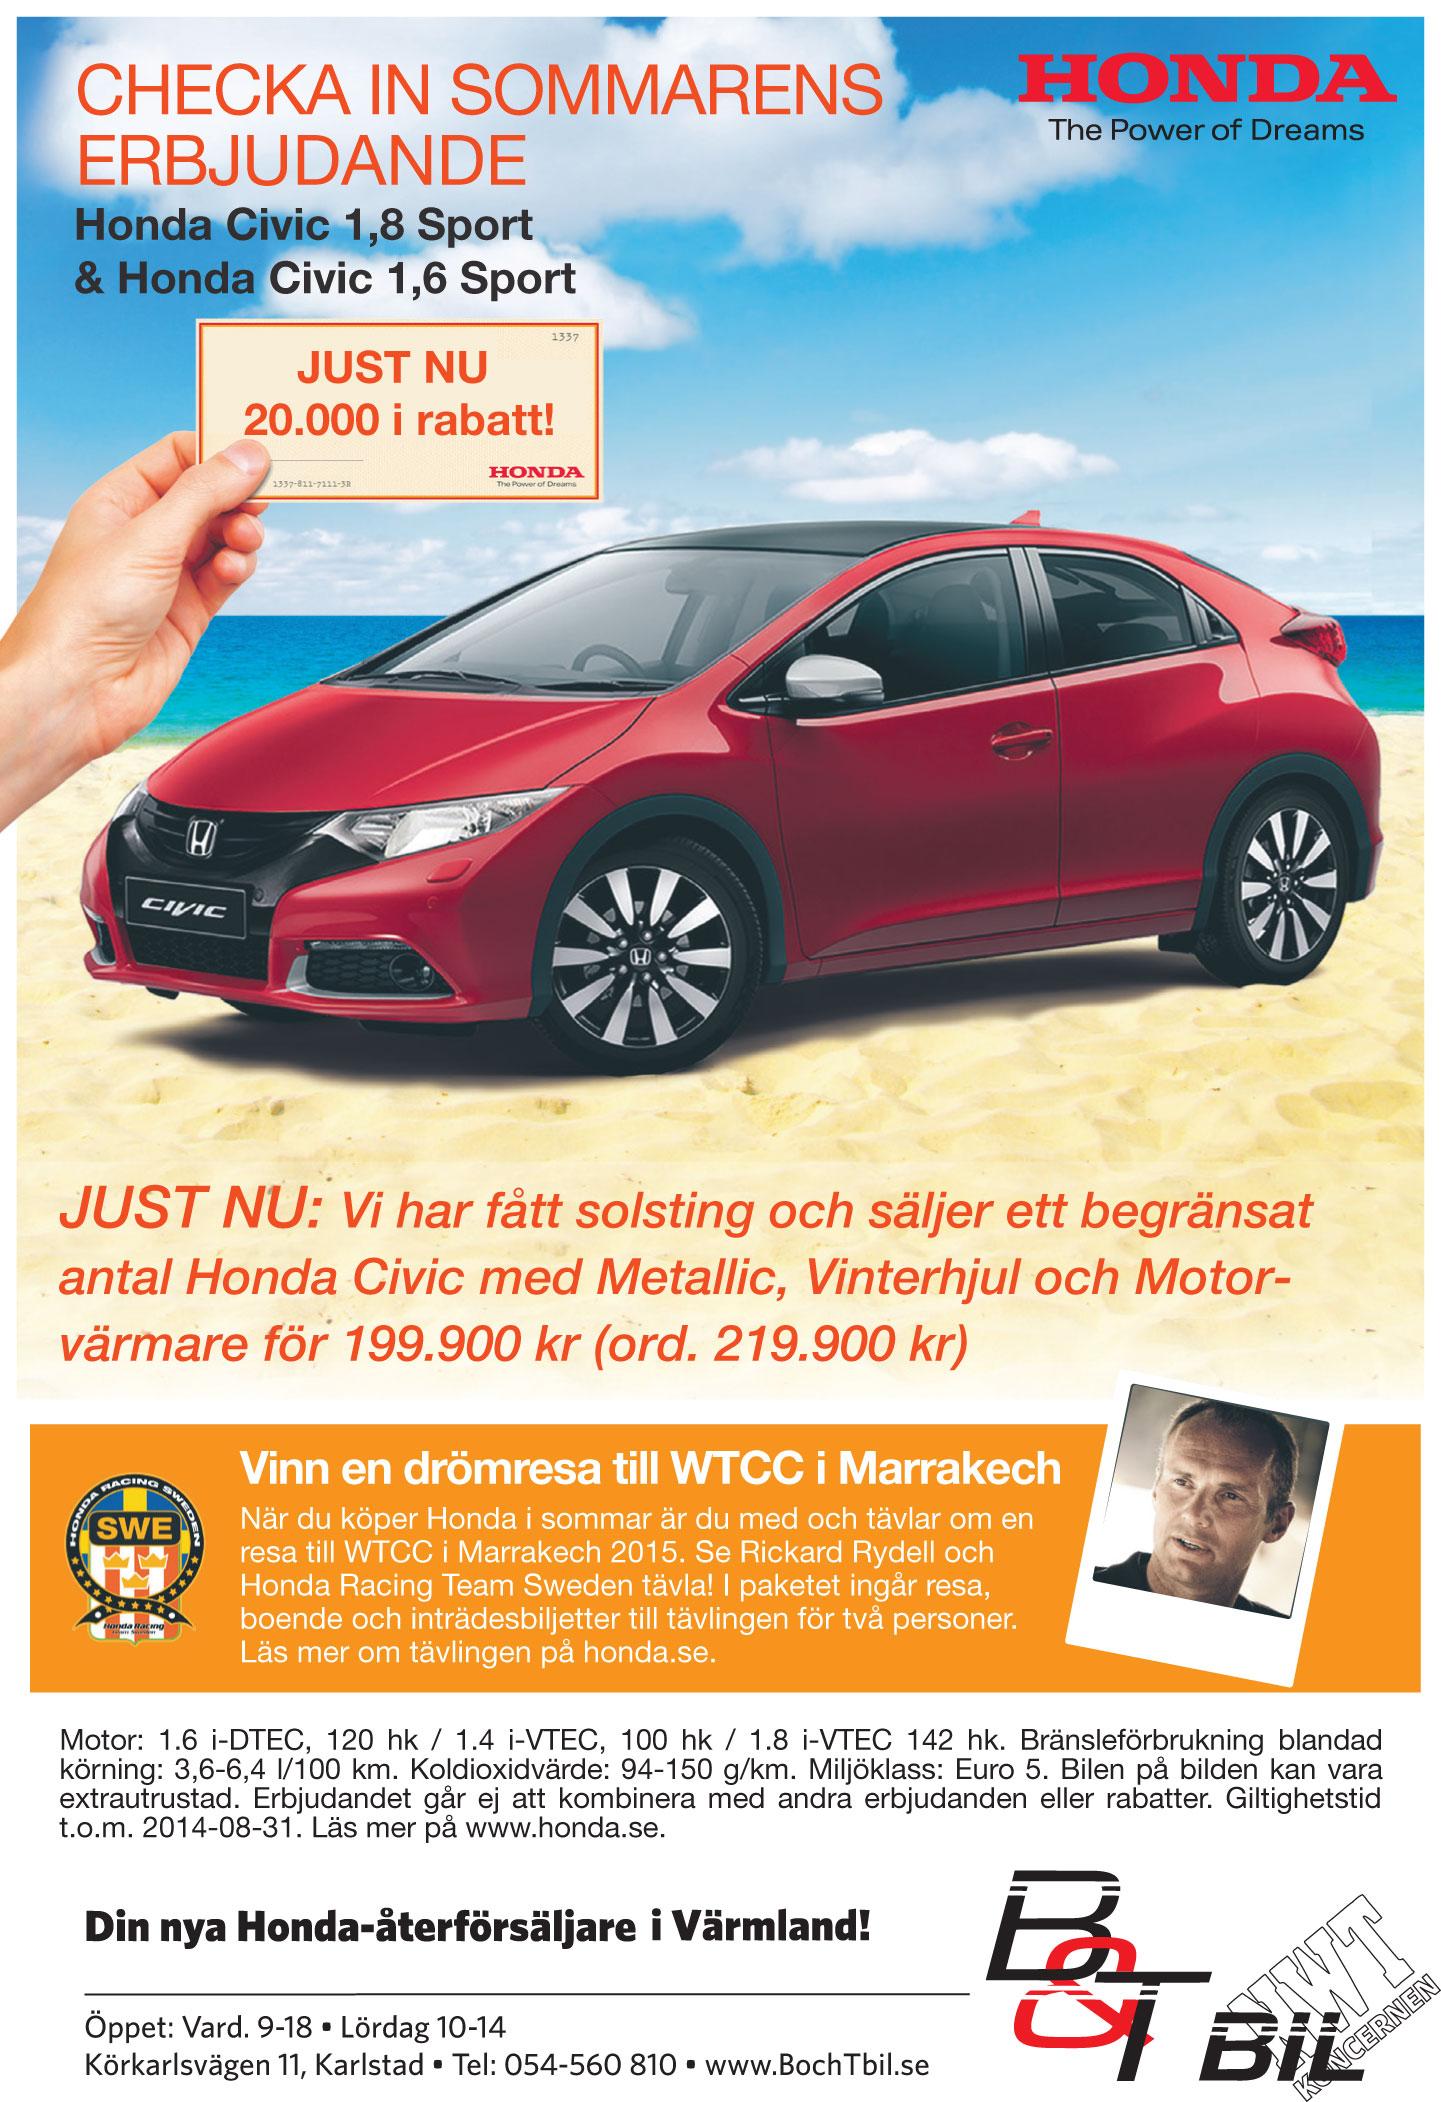 Nya bilar erbjudande under 100 000